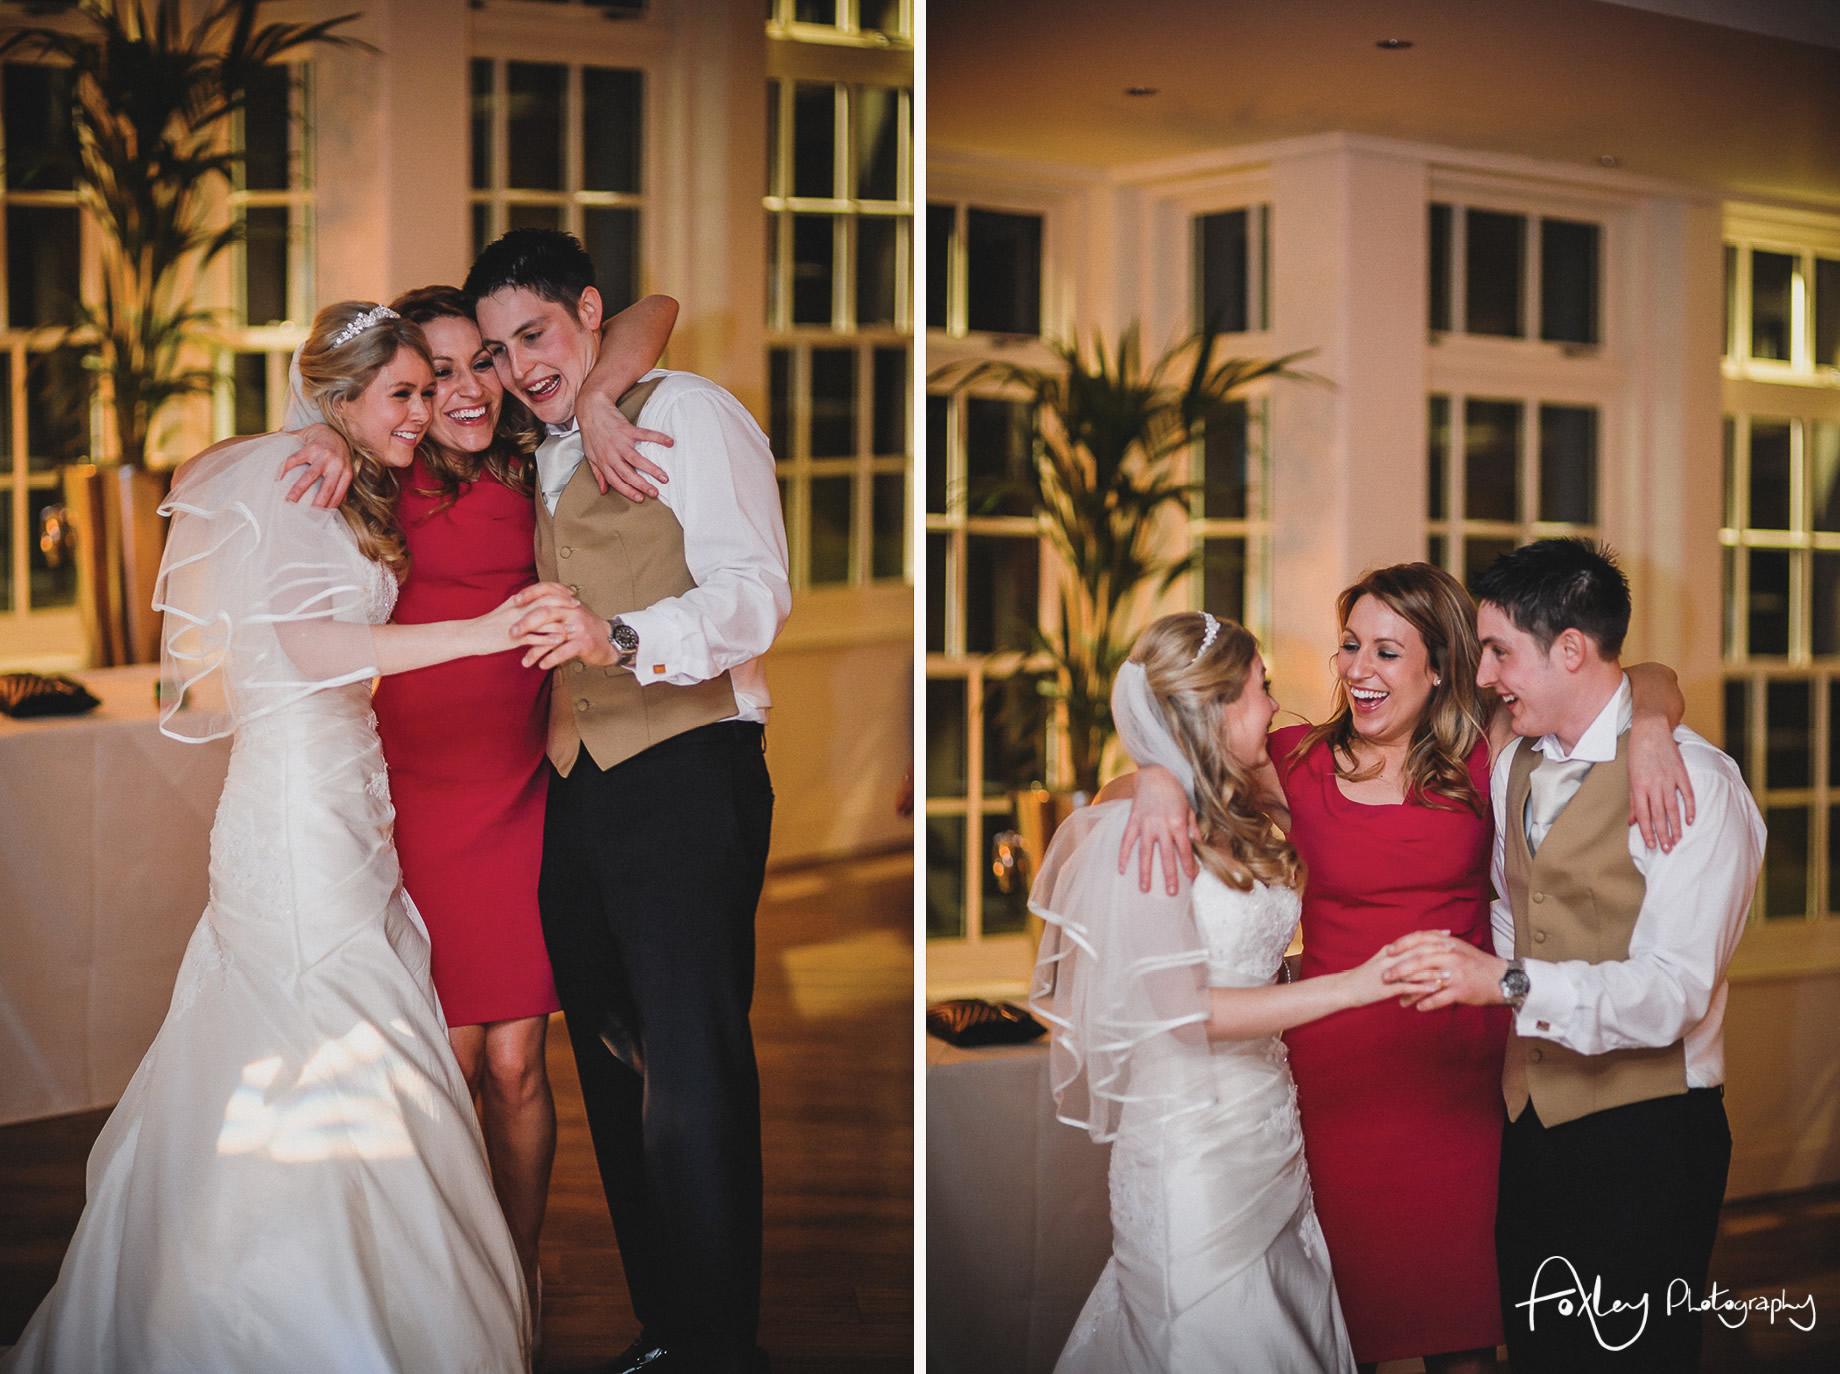 Gemma and Lewis' Wedding at Mitton Hall 170